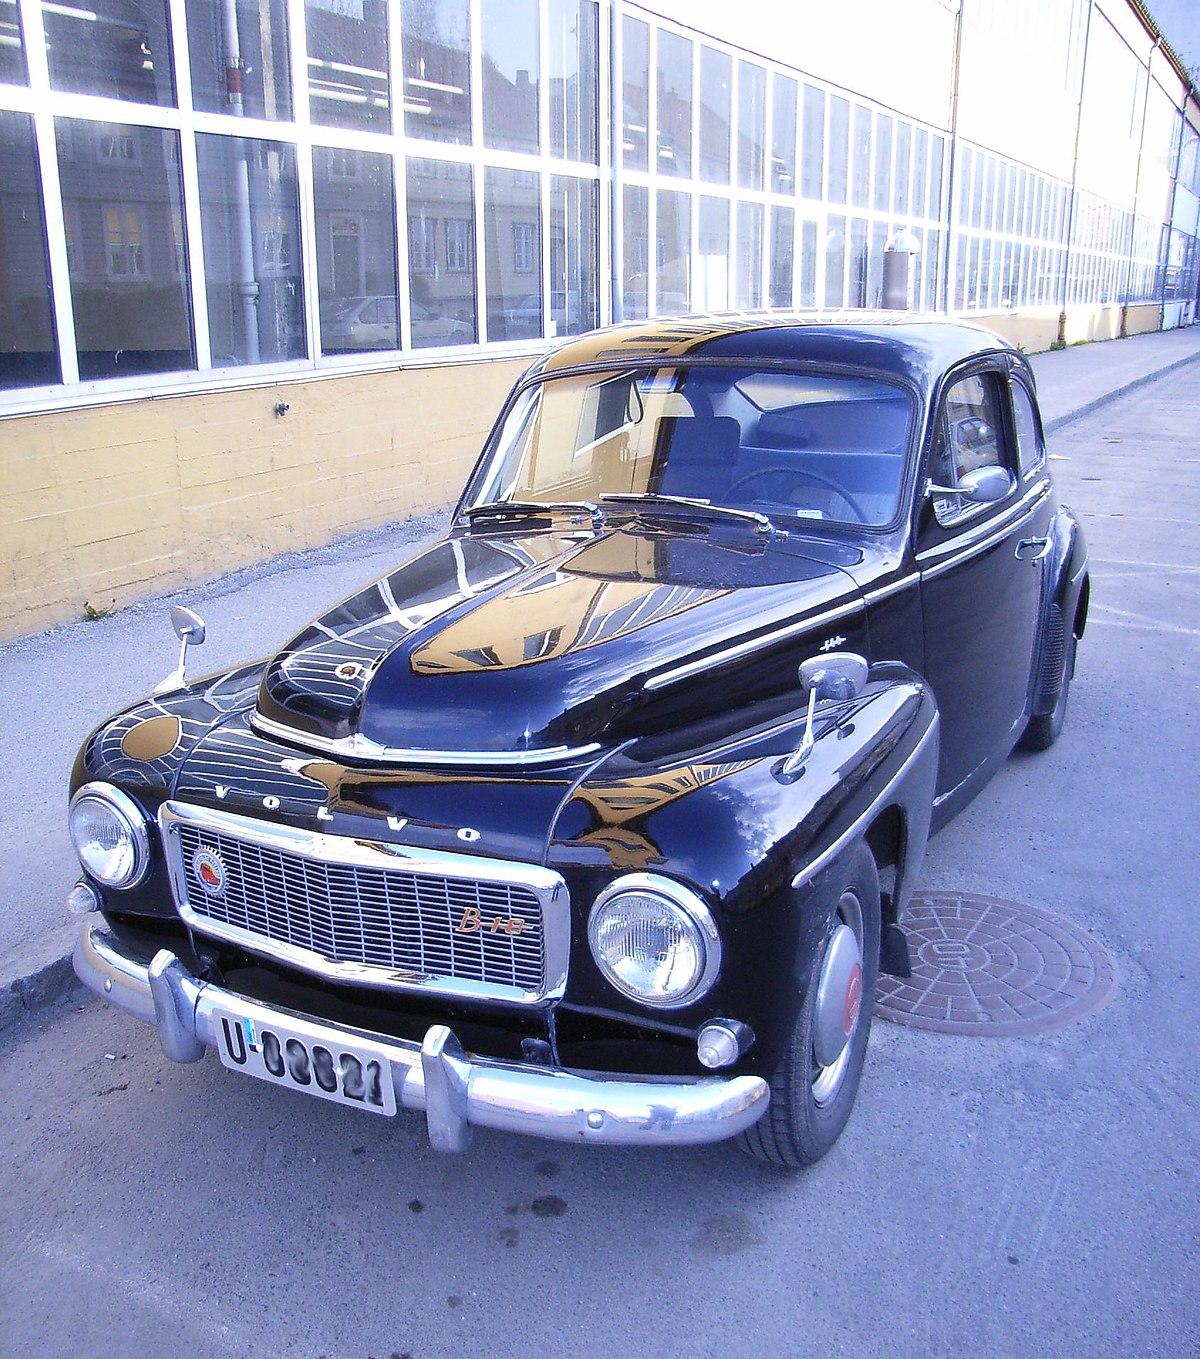 Volvo PV544 – Wikipedia